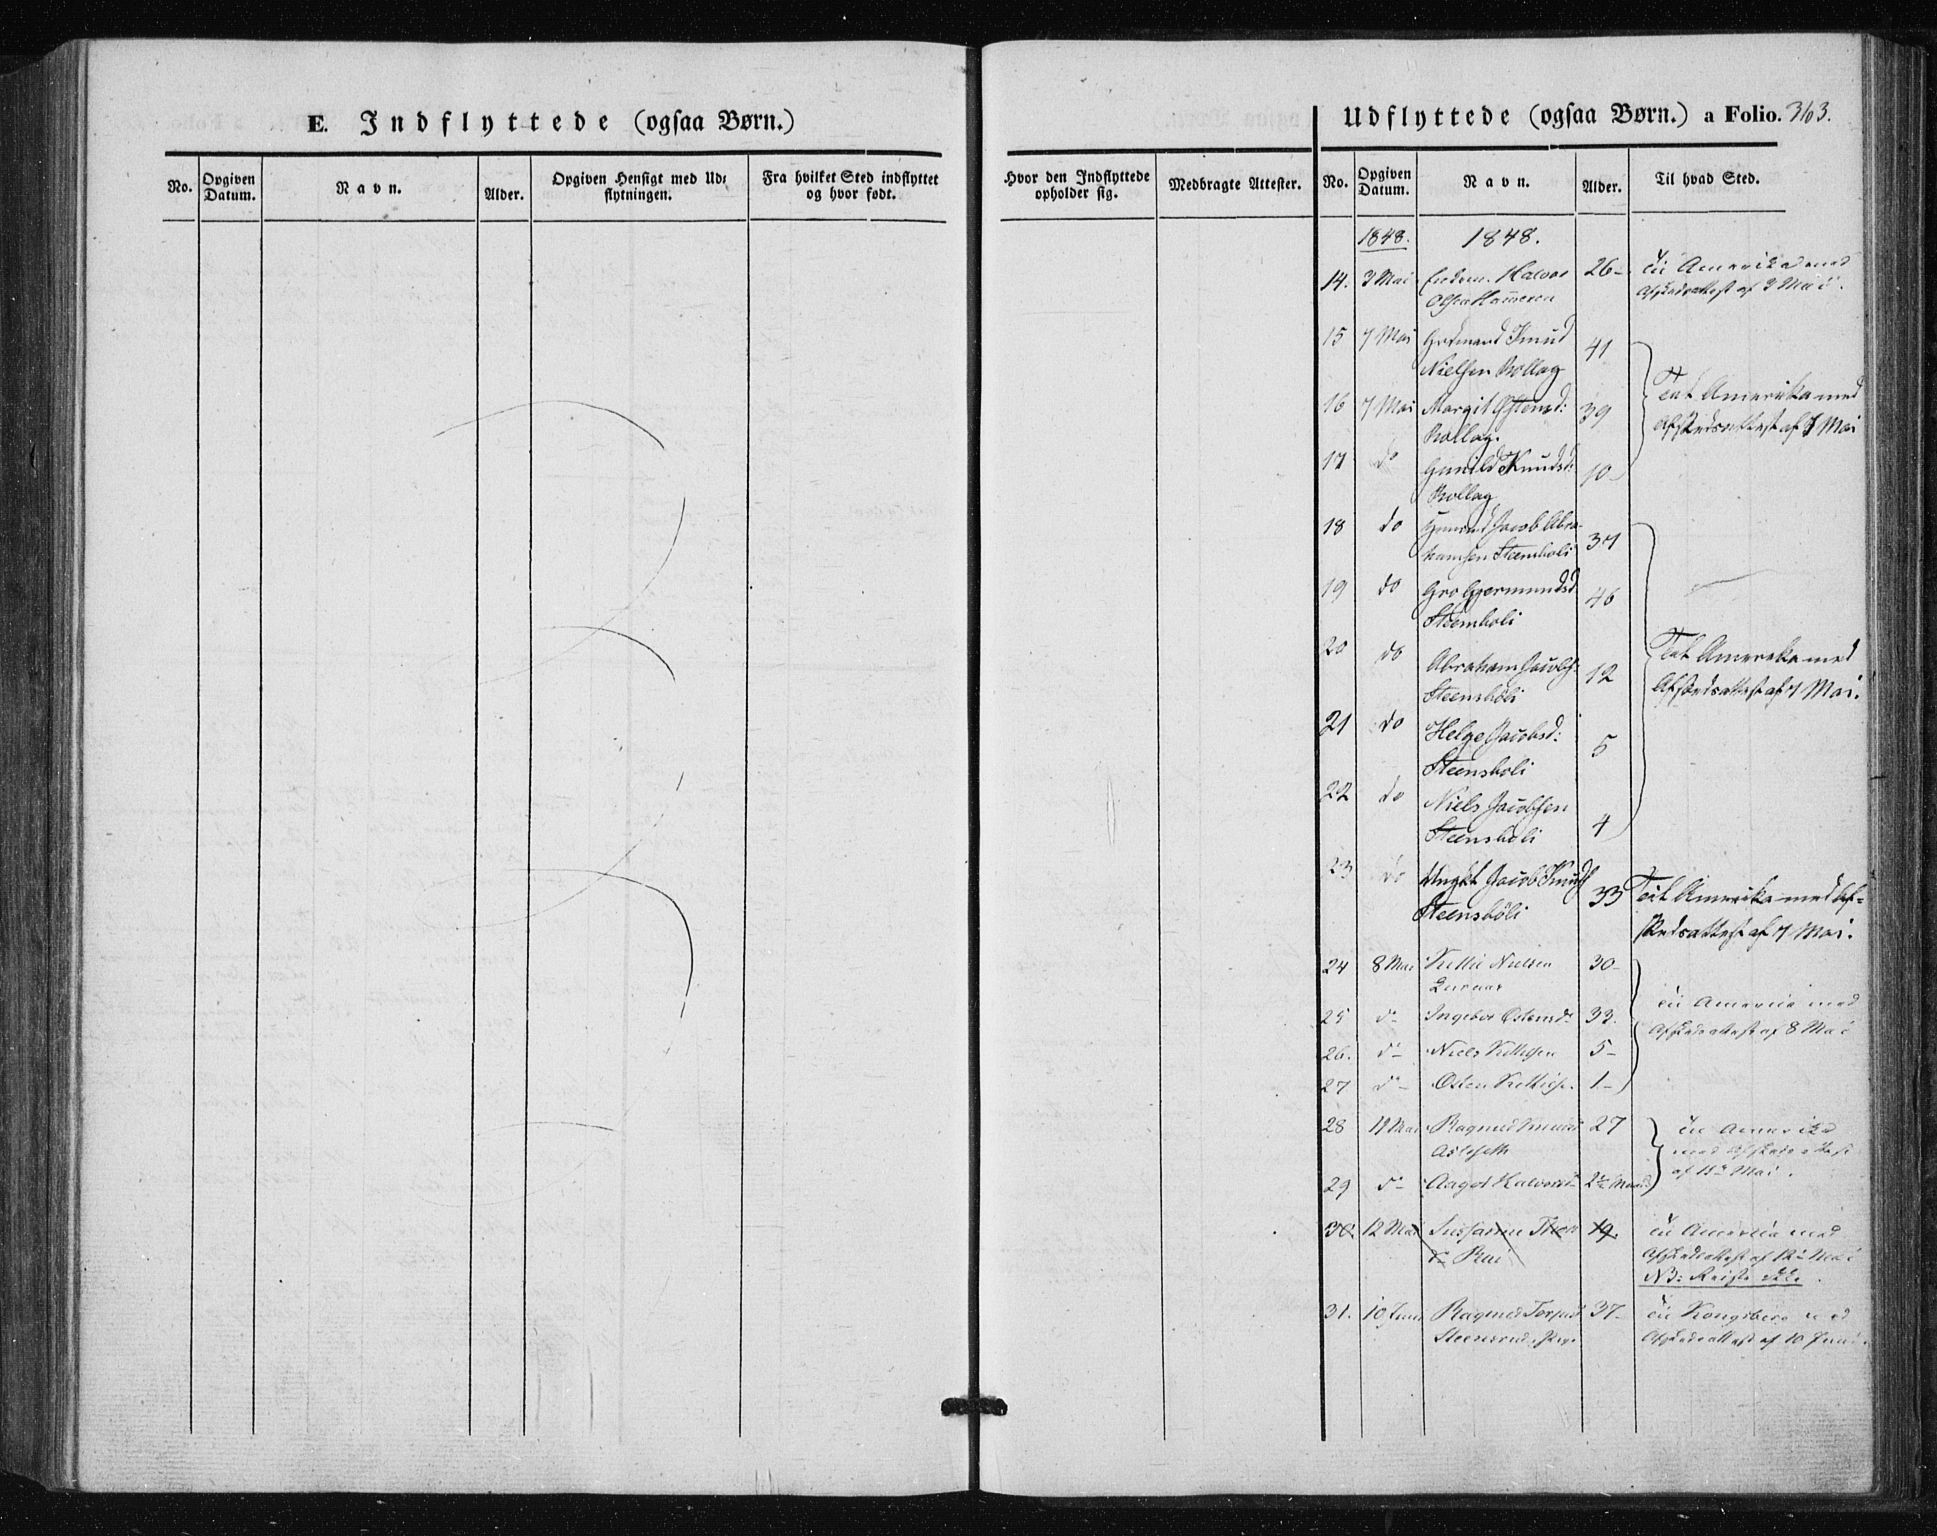 SAKO, Tinn kirkebøker, F/Fa/L0005: Ministerialbok nr. I 5, 1844-1856, s. 363